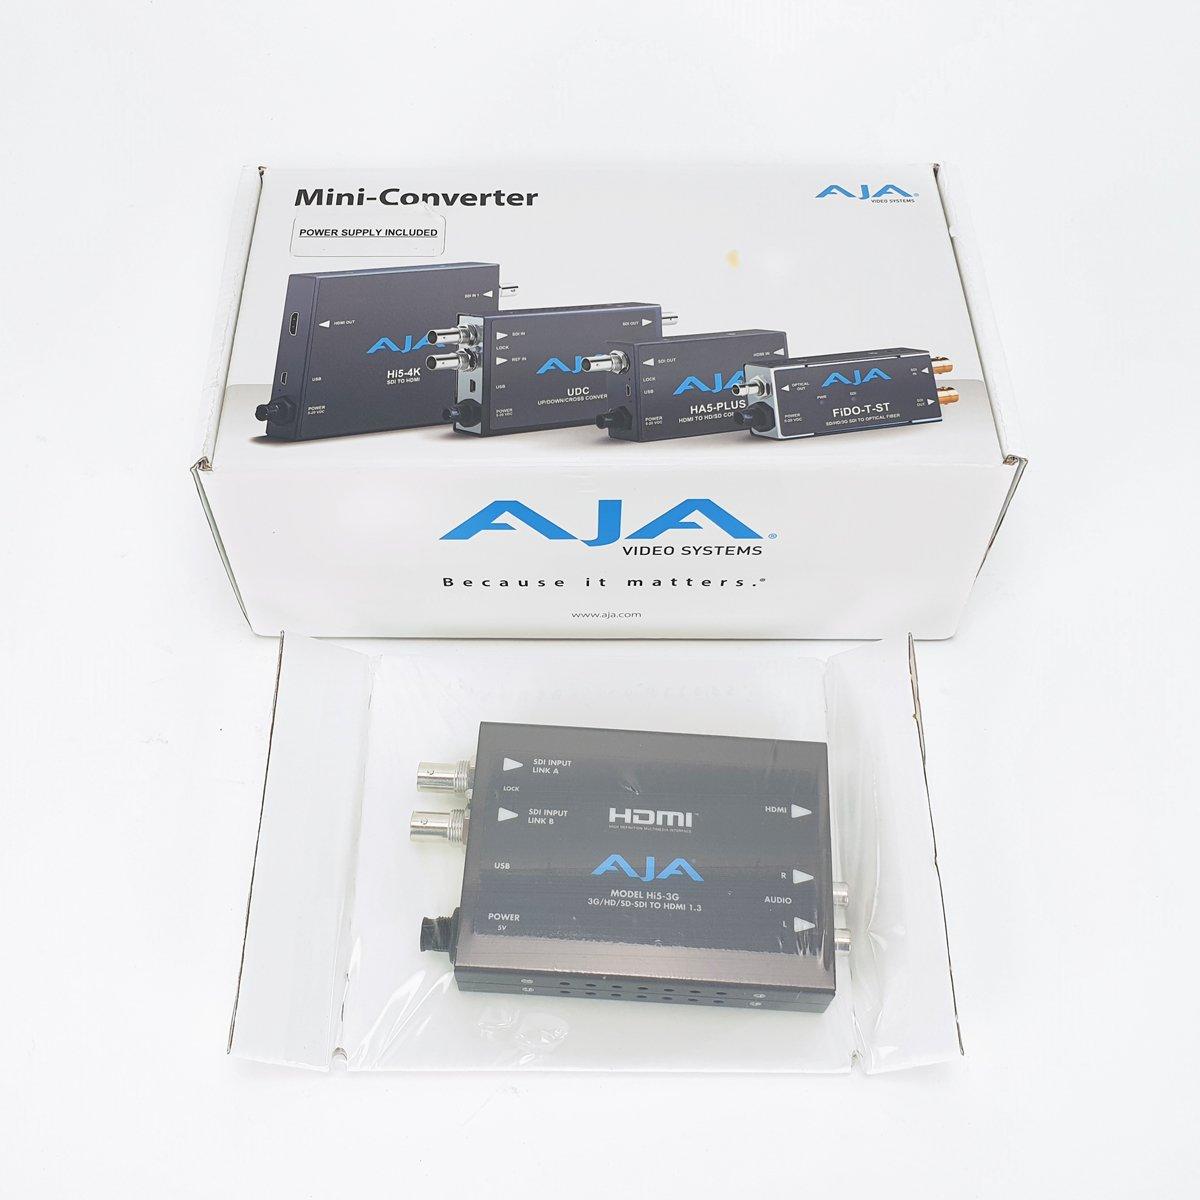 Ex-Demo AJA Hi5-3G 3G-SDI to HDMI converter